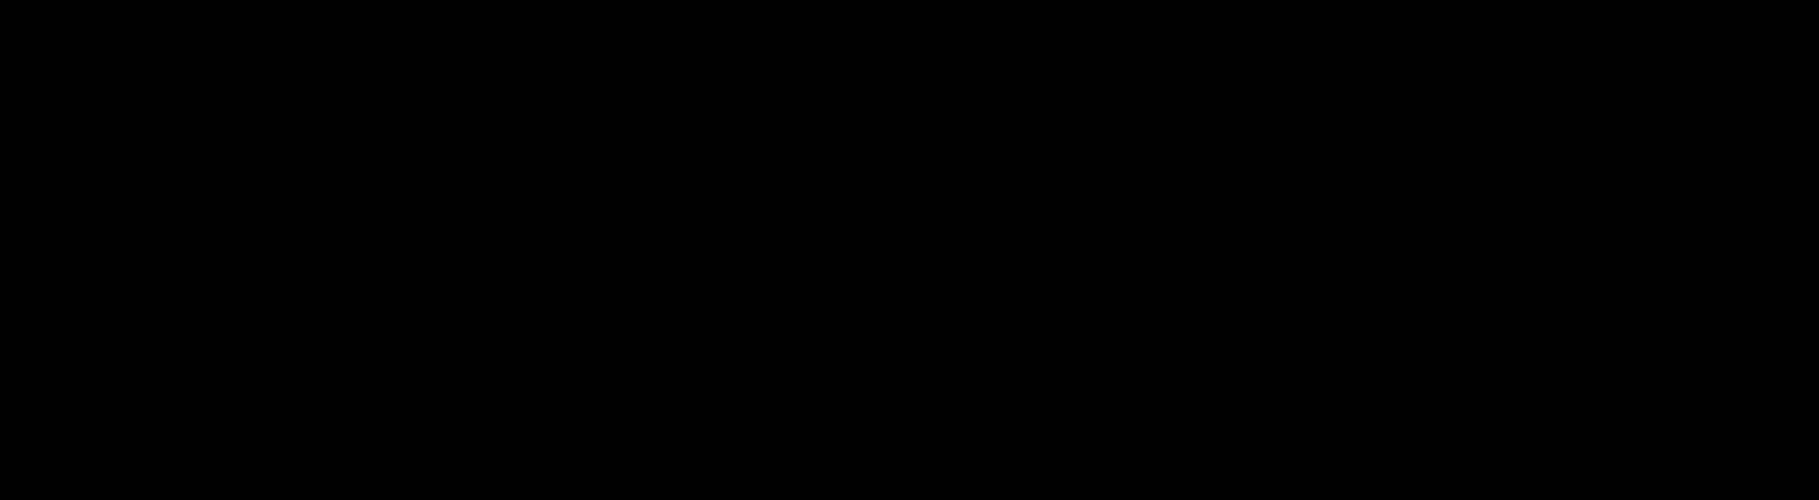 Fupping-Logo